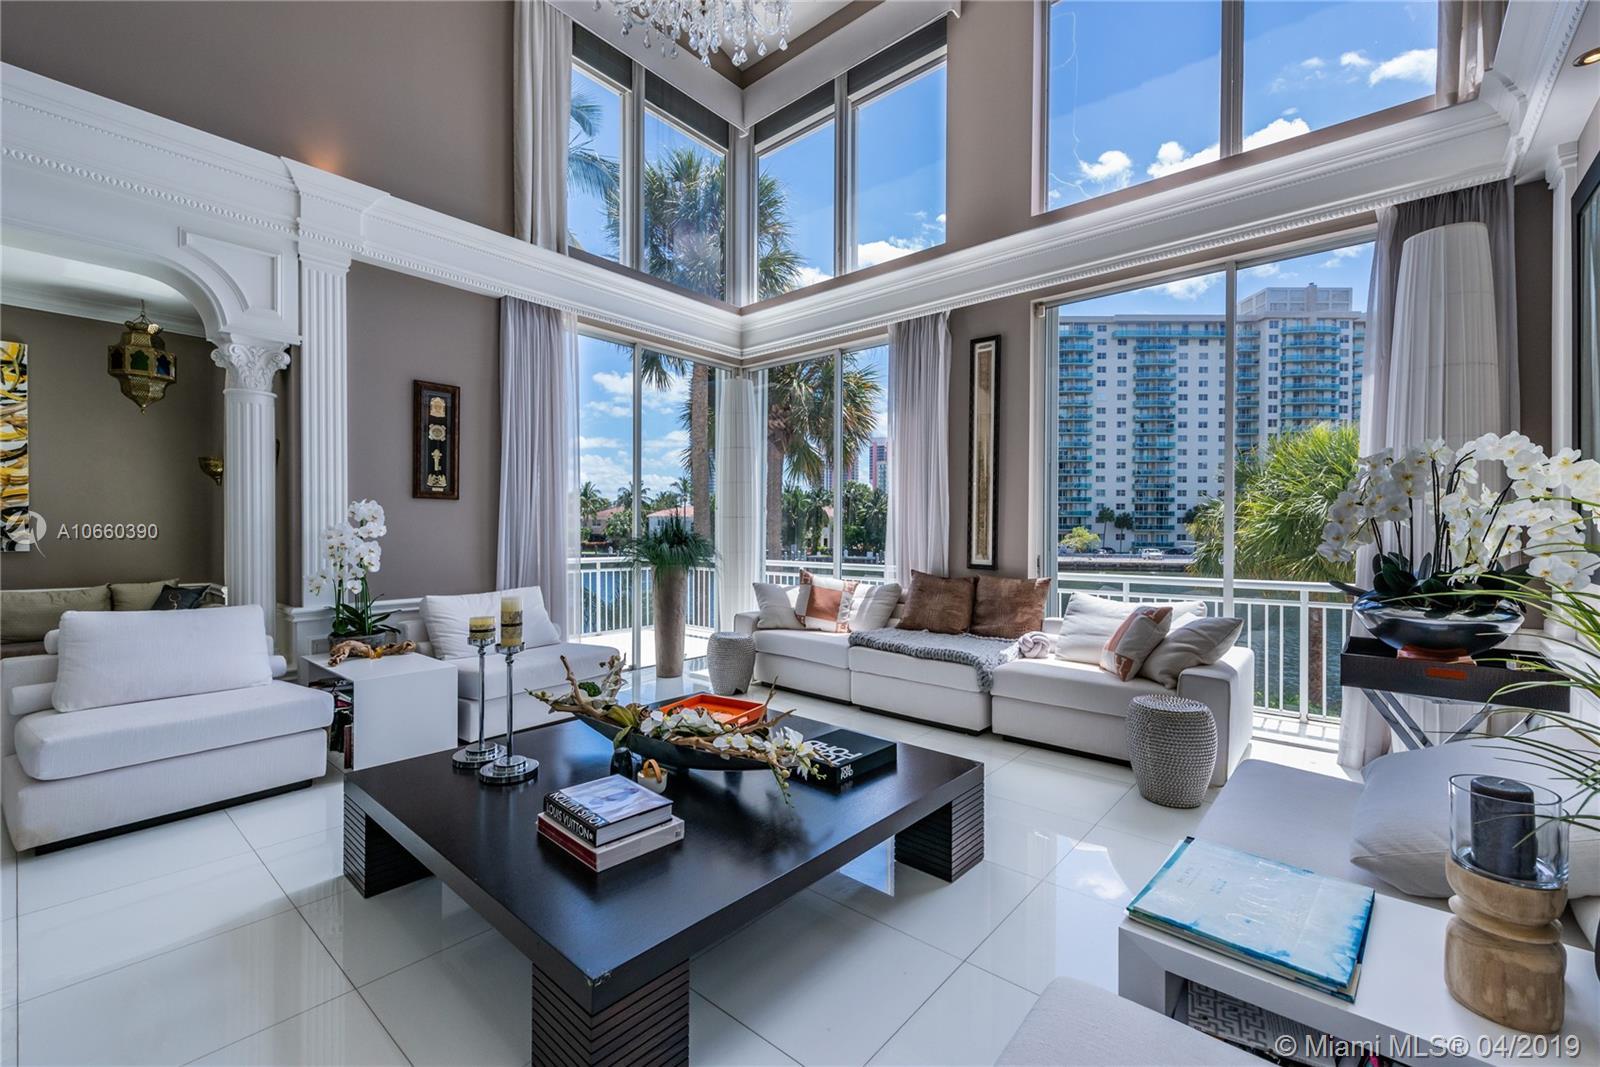 image #1 of property, Aventura 9th Addn